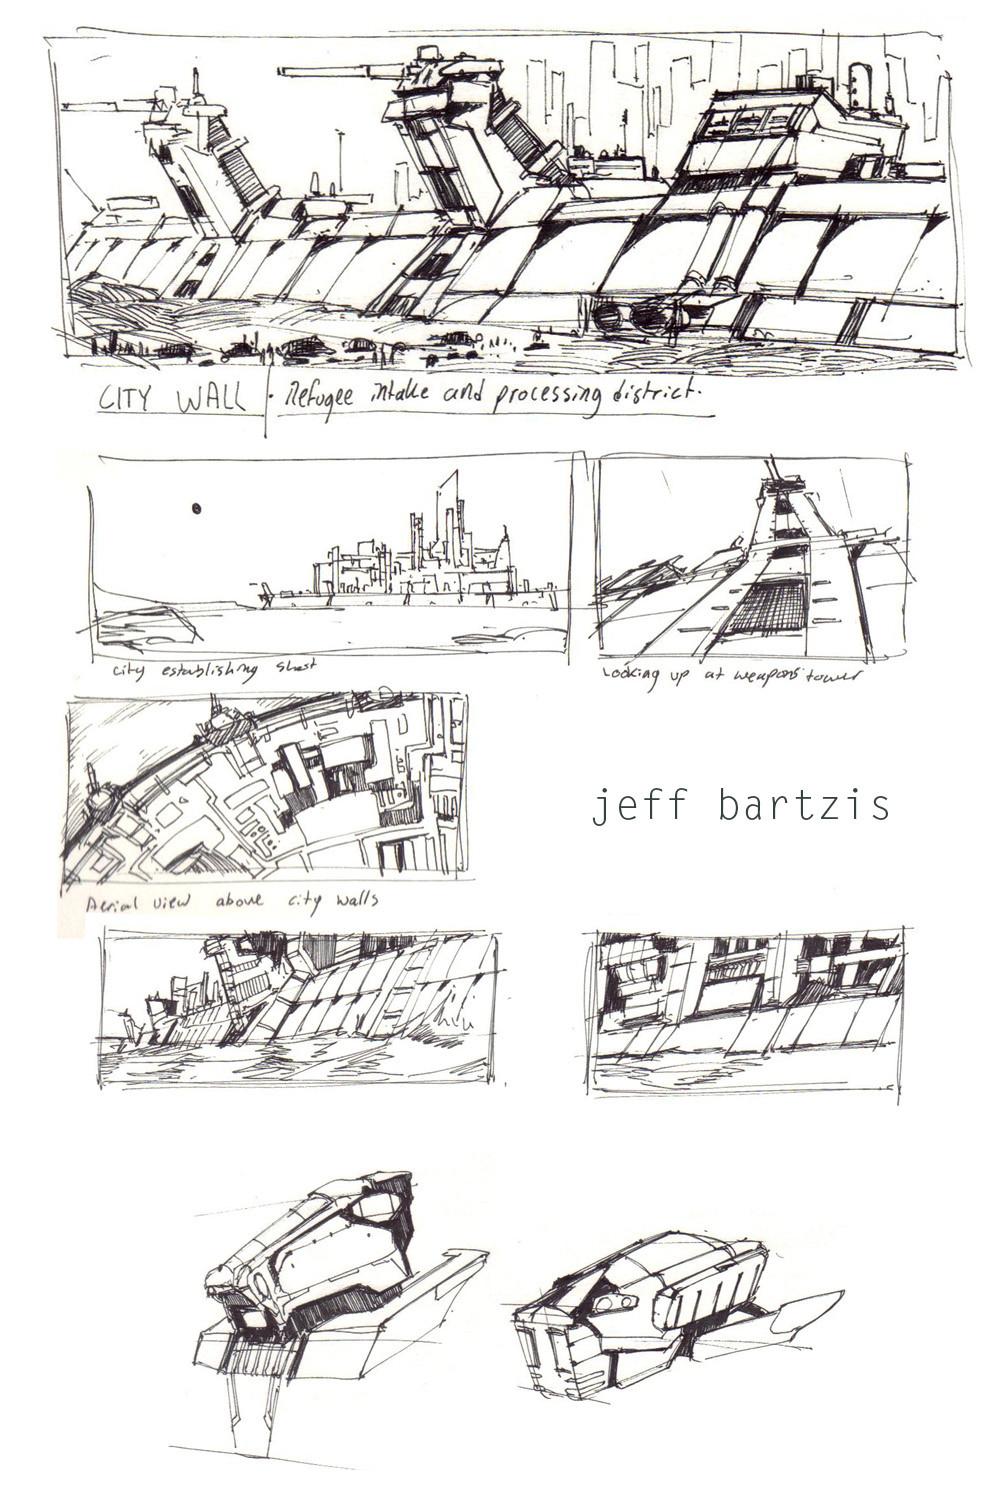 Jeff bartzis sketchbook stuff 046